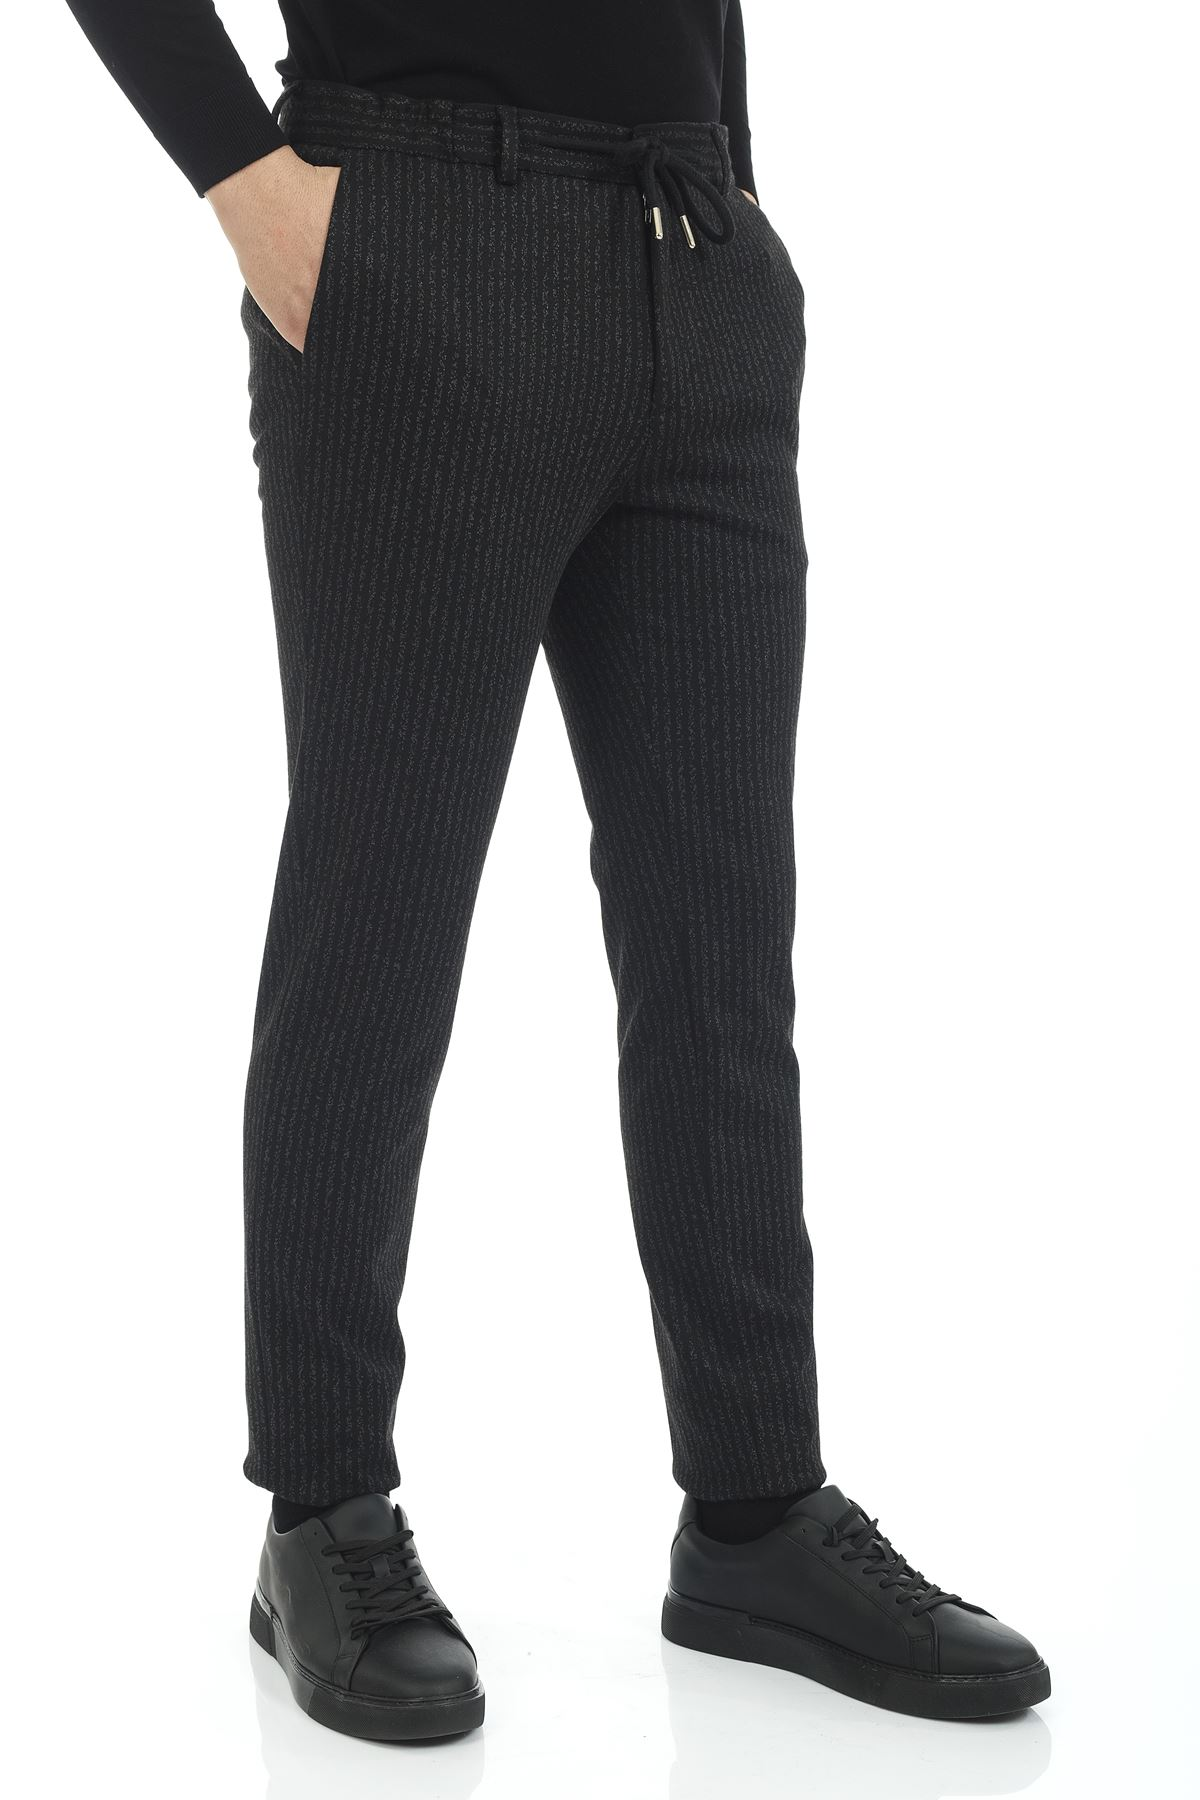 Siyah Beyaz Çizgili Süper Slim Kalıp Jogger Pantolon